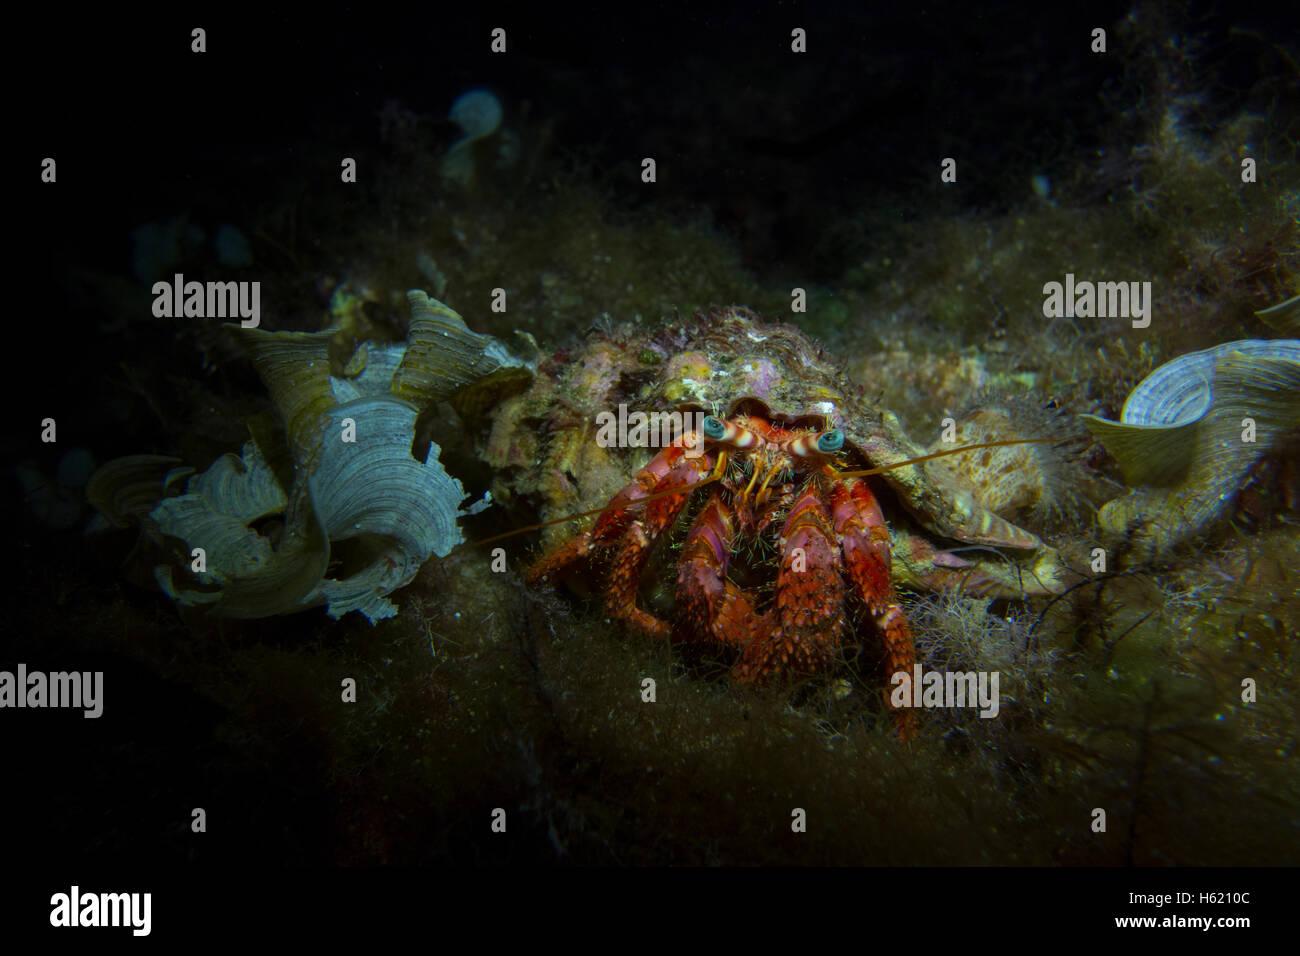 Red Hermit Crab, Dardanus calidus, from the Mediterranean Sea, Malta. - Stock Image